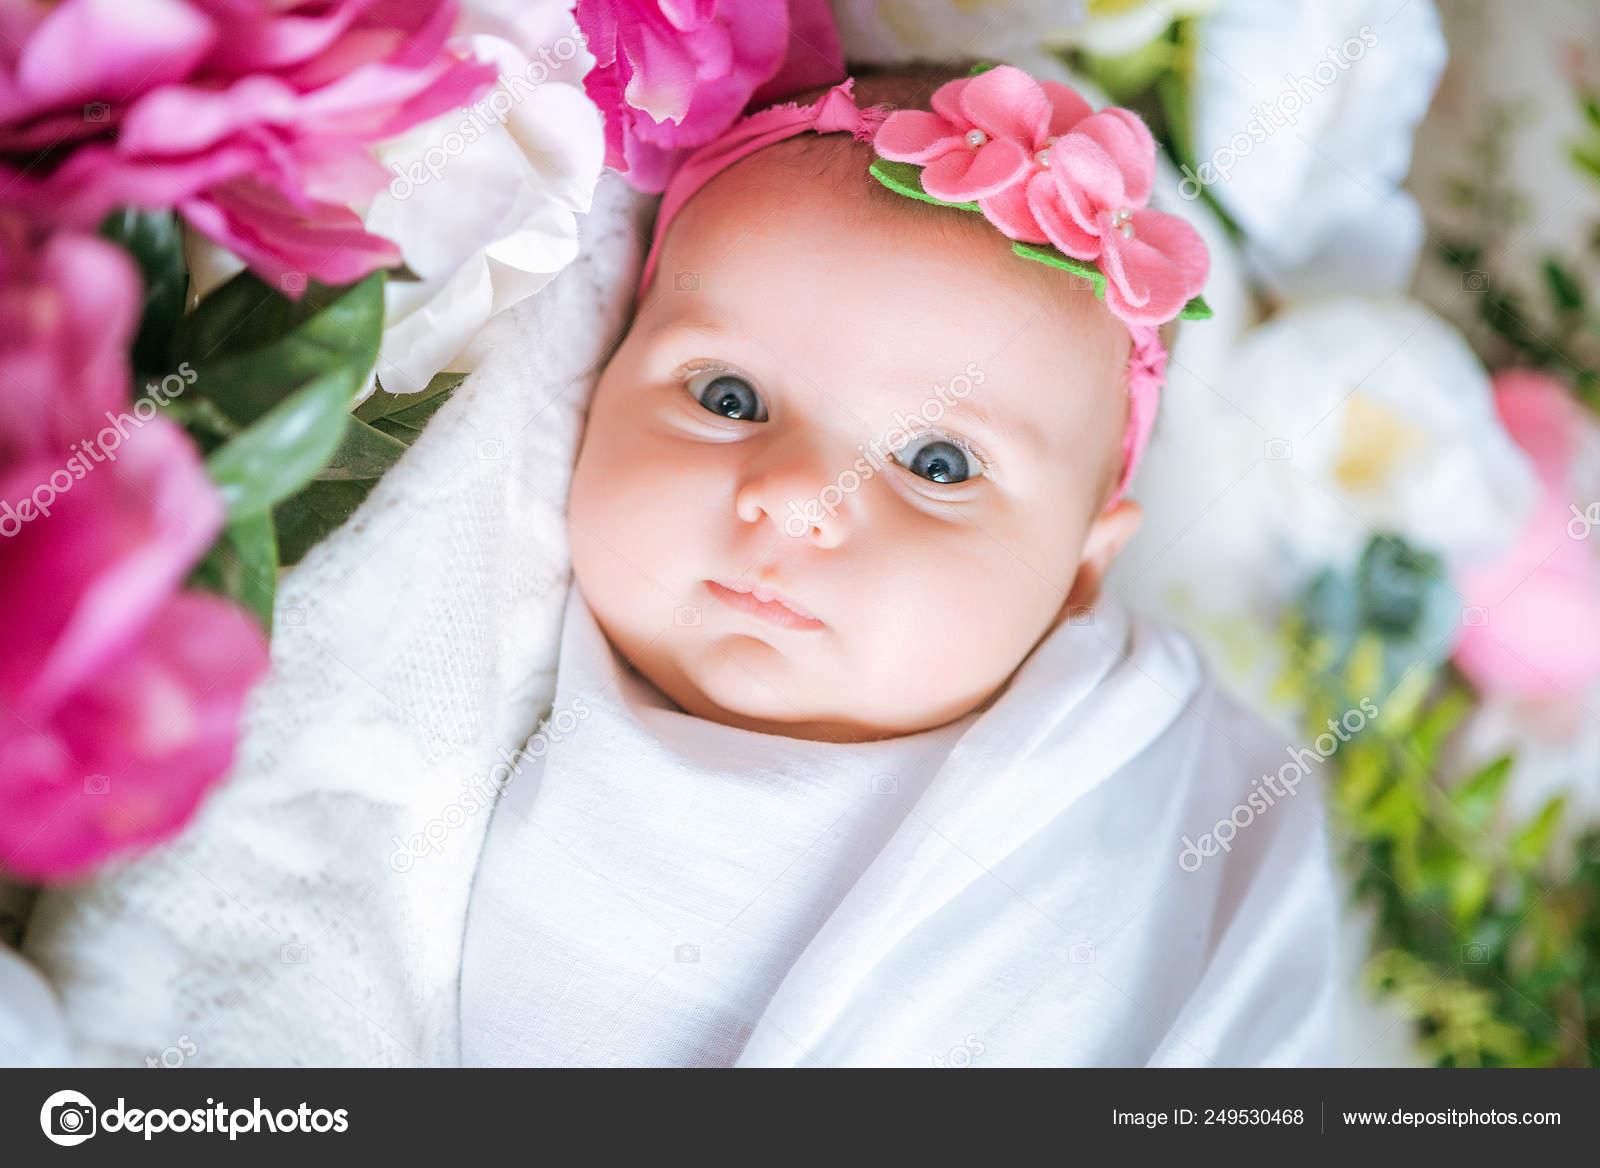 f5fea0fe7b Newborn Baby Flower Dressing Lies Spring Flowers — Stock Photo ...